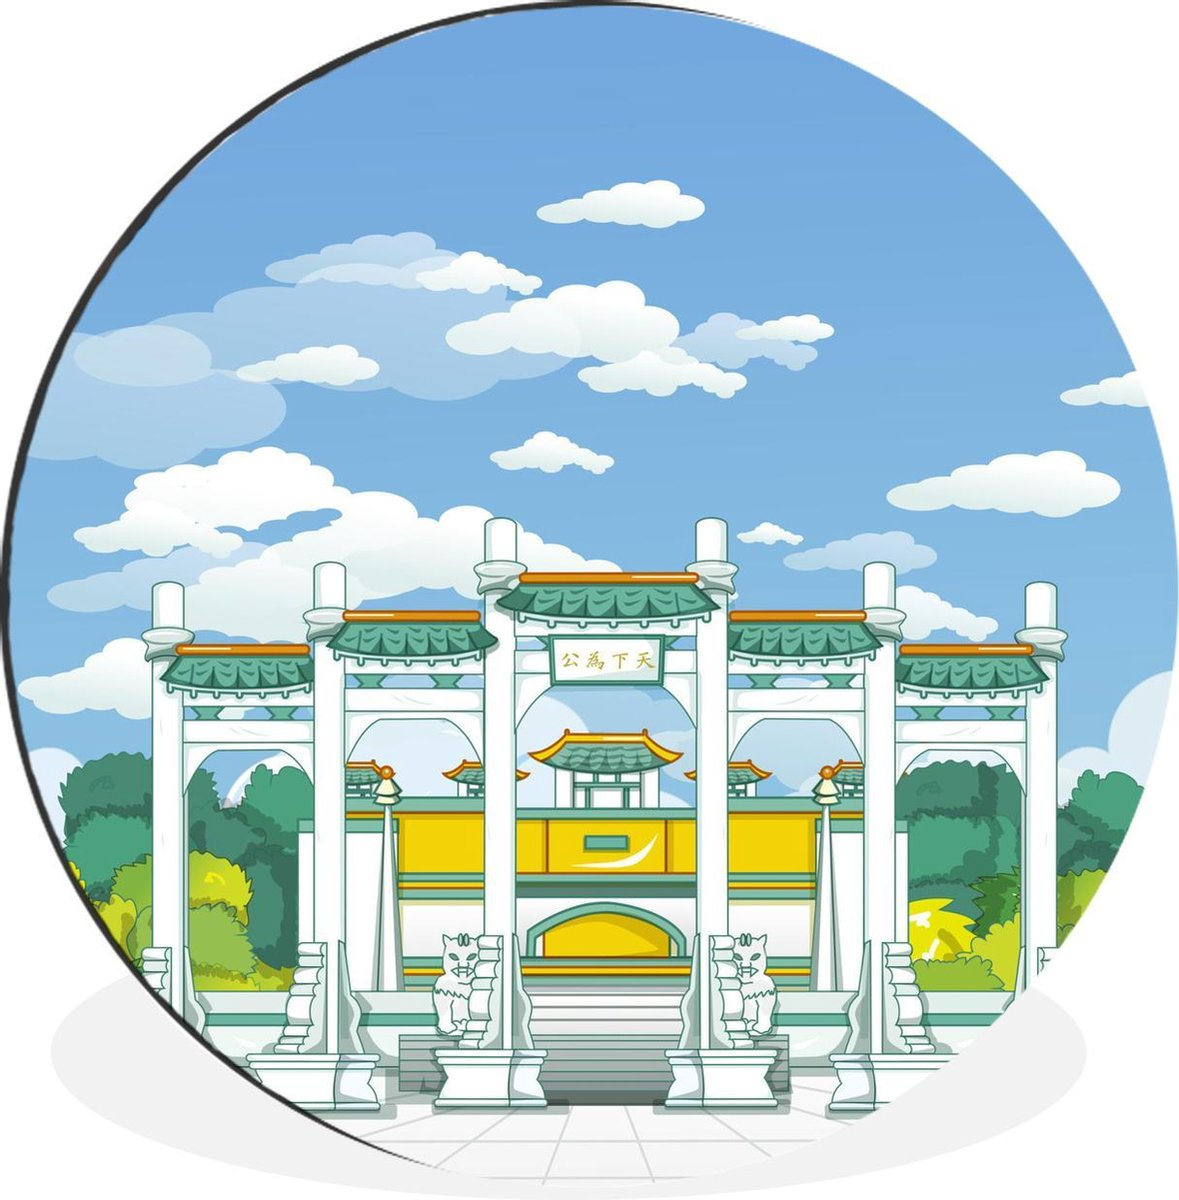 Wandcirkel Taipei illustratie aluminium - Illustratie vanNational Palace Museum in Taipei -   90 cm - rond schilderij - fotoprint op aluminium / dibond / muurcirkel / wooncirkel / tuincirkel (wanddecoratie)